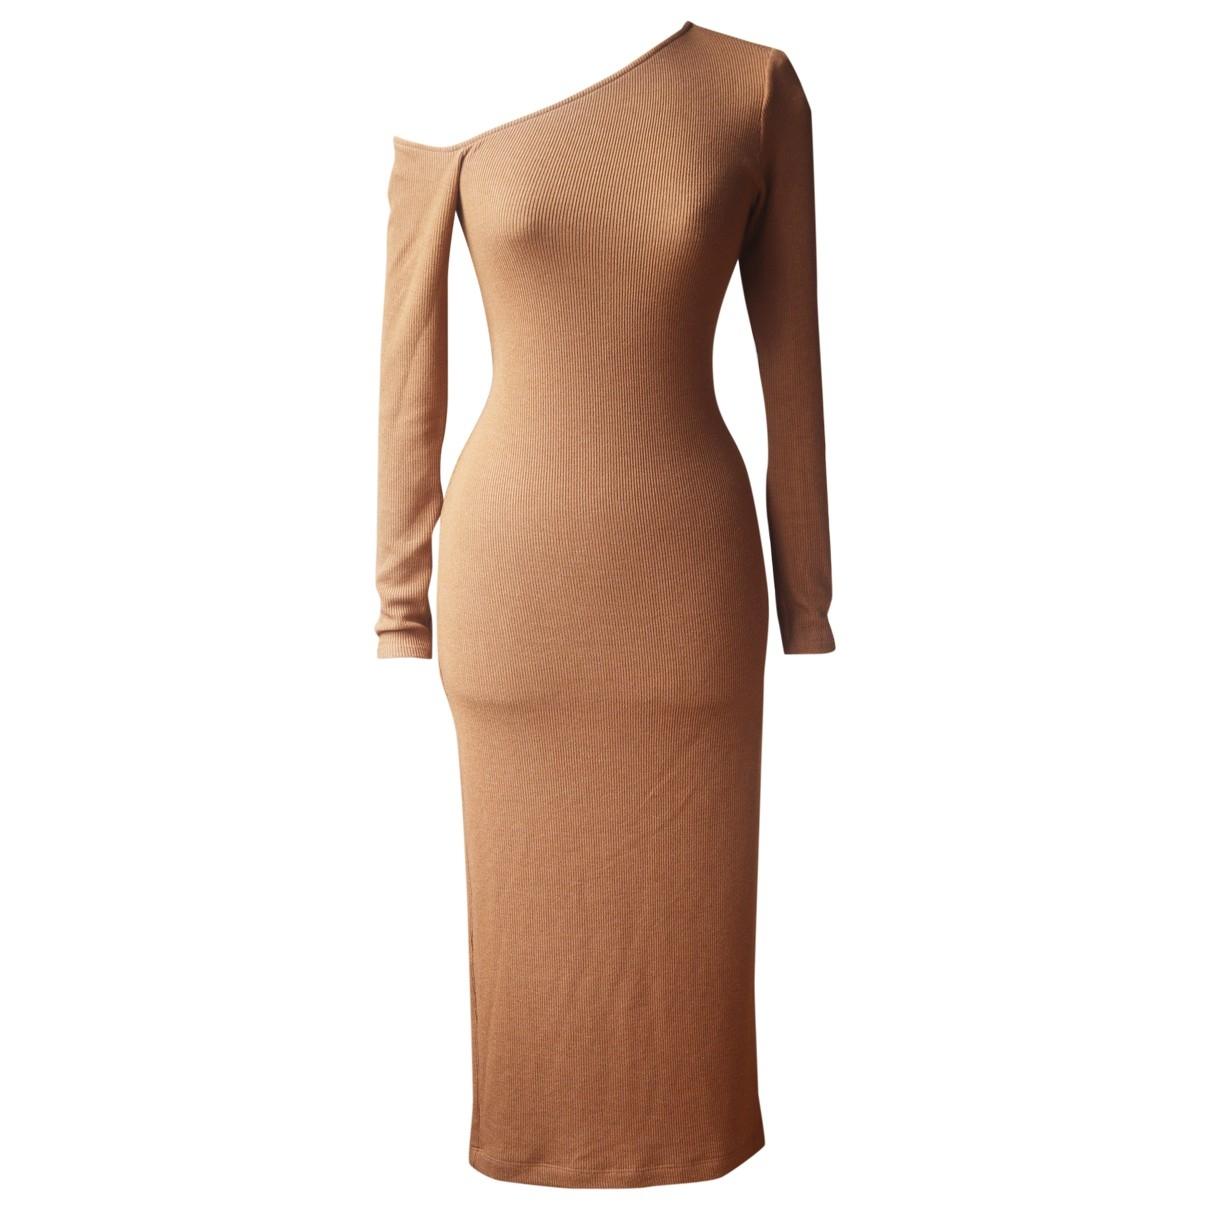 Enza Costa \N Kleid in  Braun Polyester